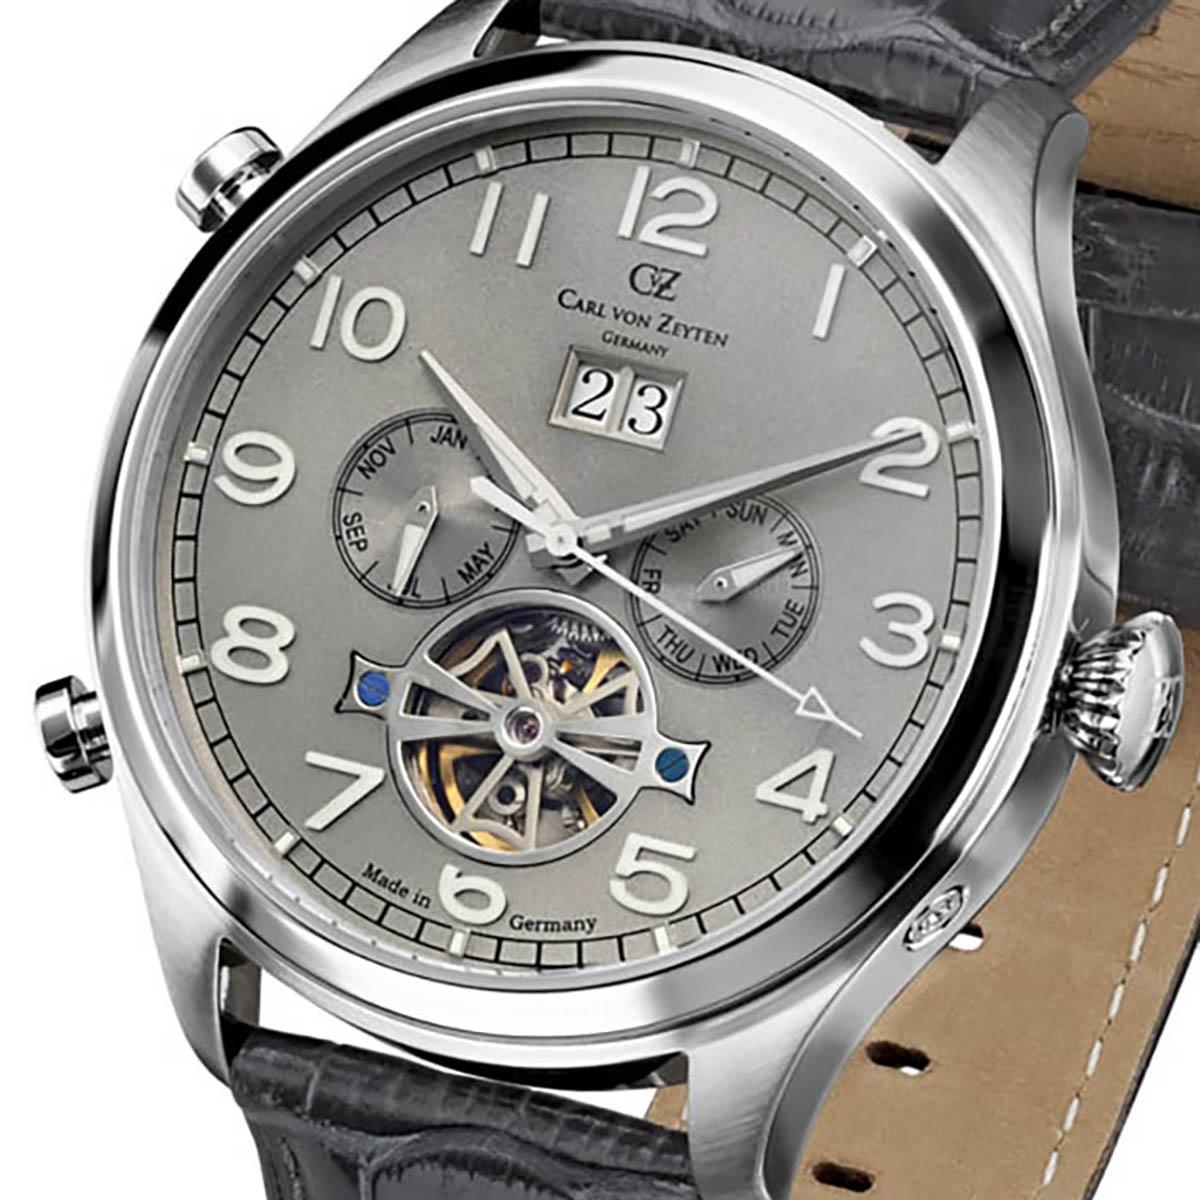 Carl von Zeyten カール・フォン・ツォイテン 自動巻き(手巻き機能あり) 腕時計 [CvZ0003SGY] 正規品  カレンダー スケルトン